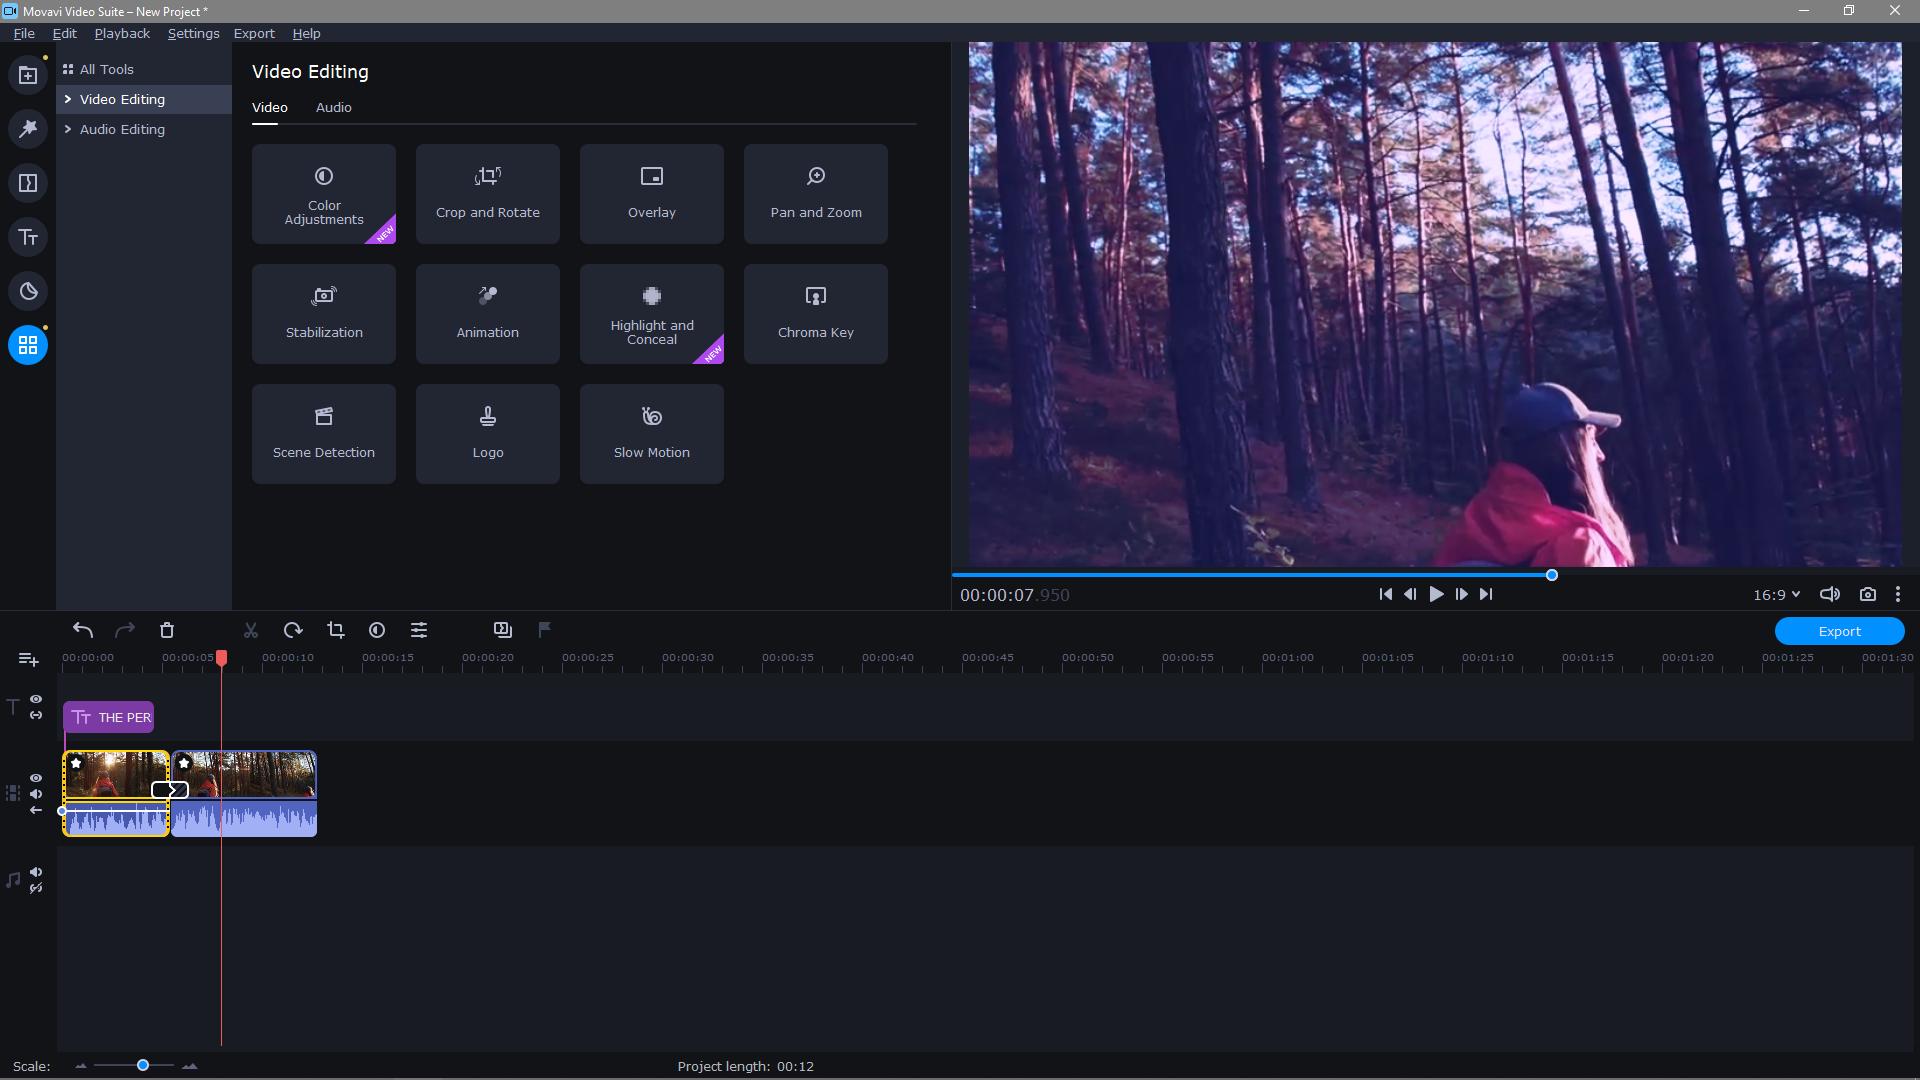 Movavi Video Editor Plus video editing portal